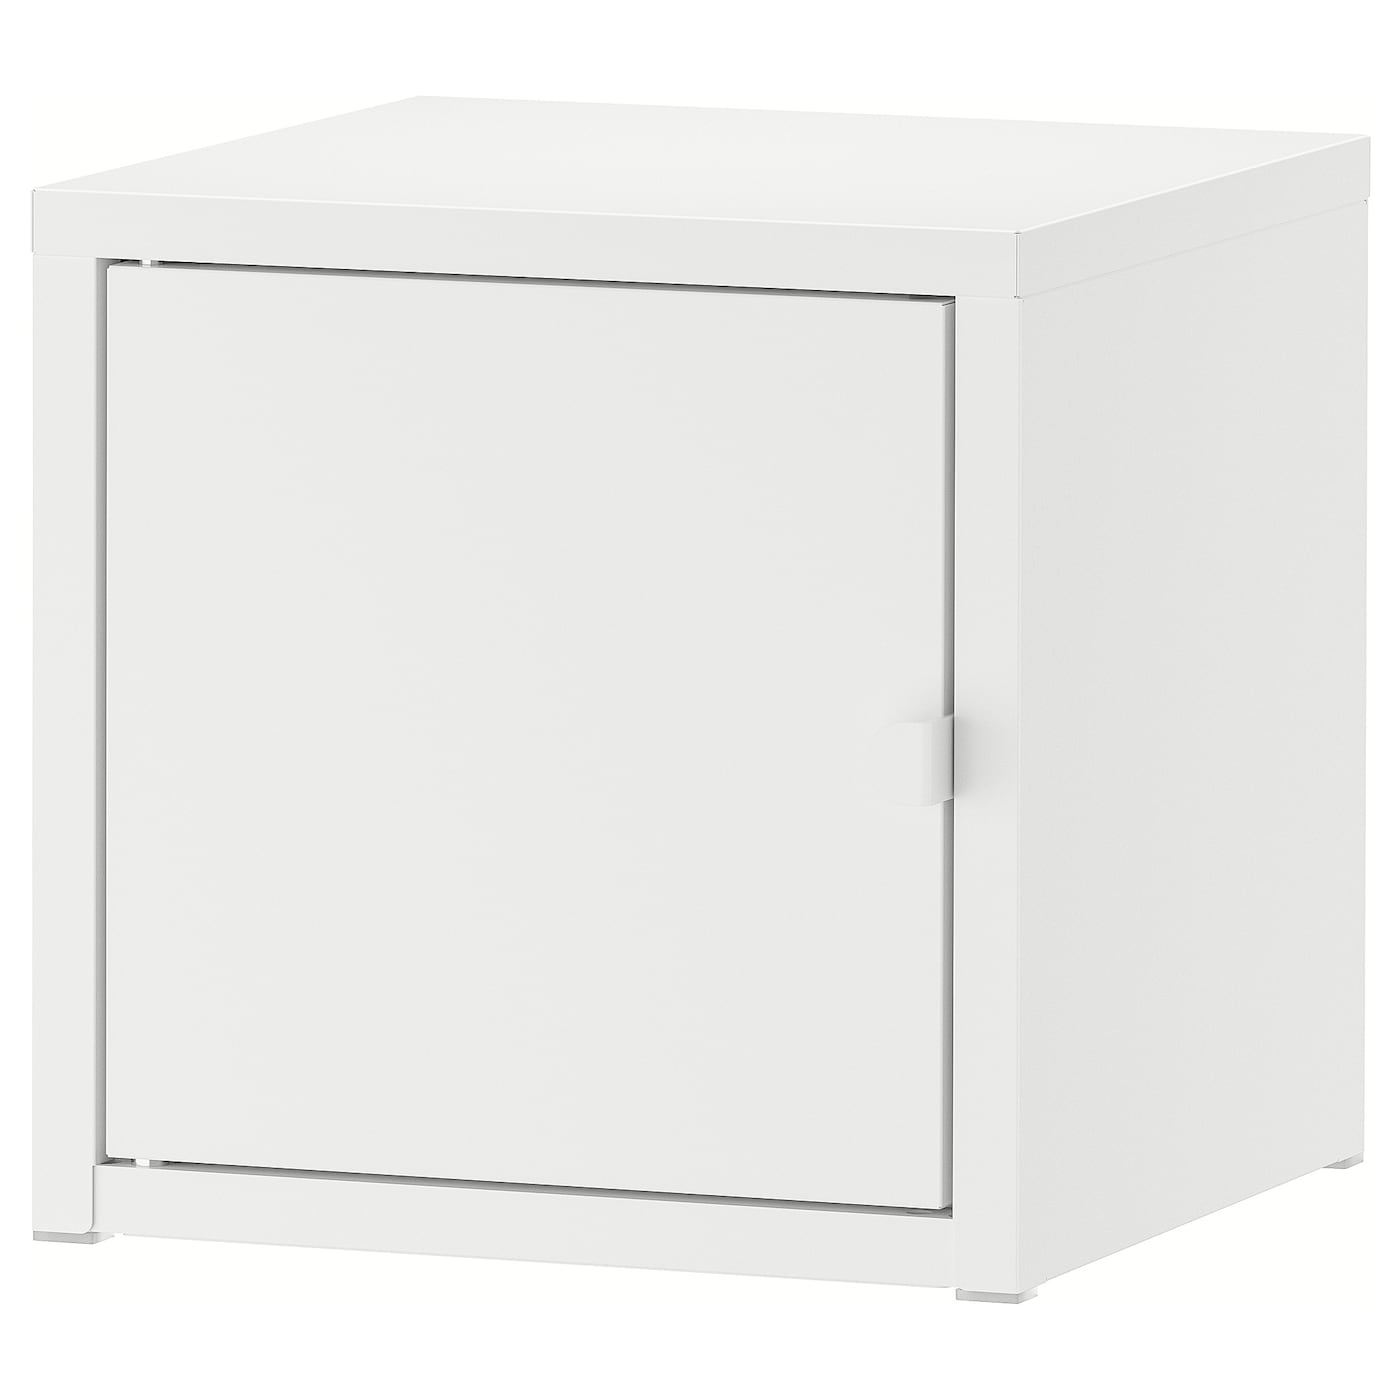 Vitrinekast Hoogglans Wit Ikea.Opbergkasten Ikea